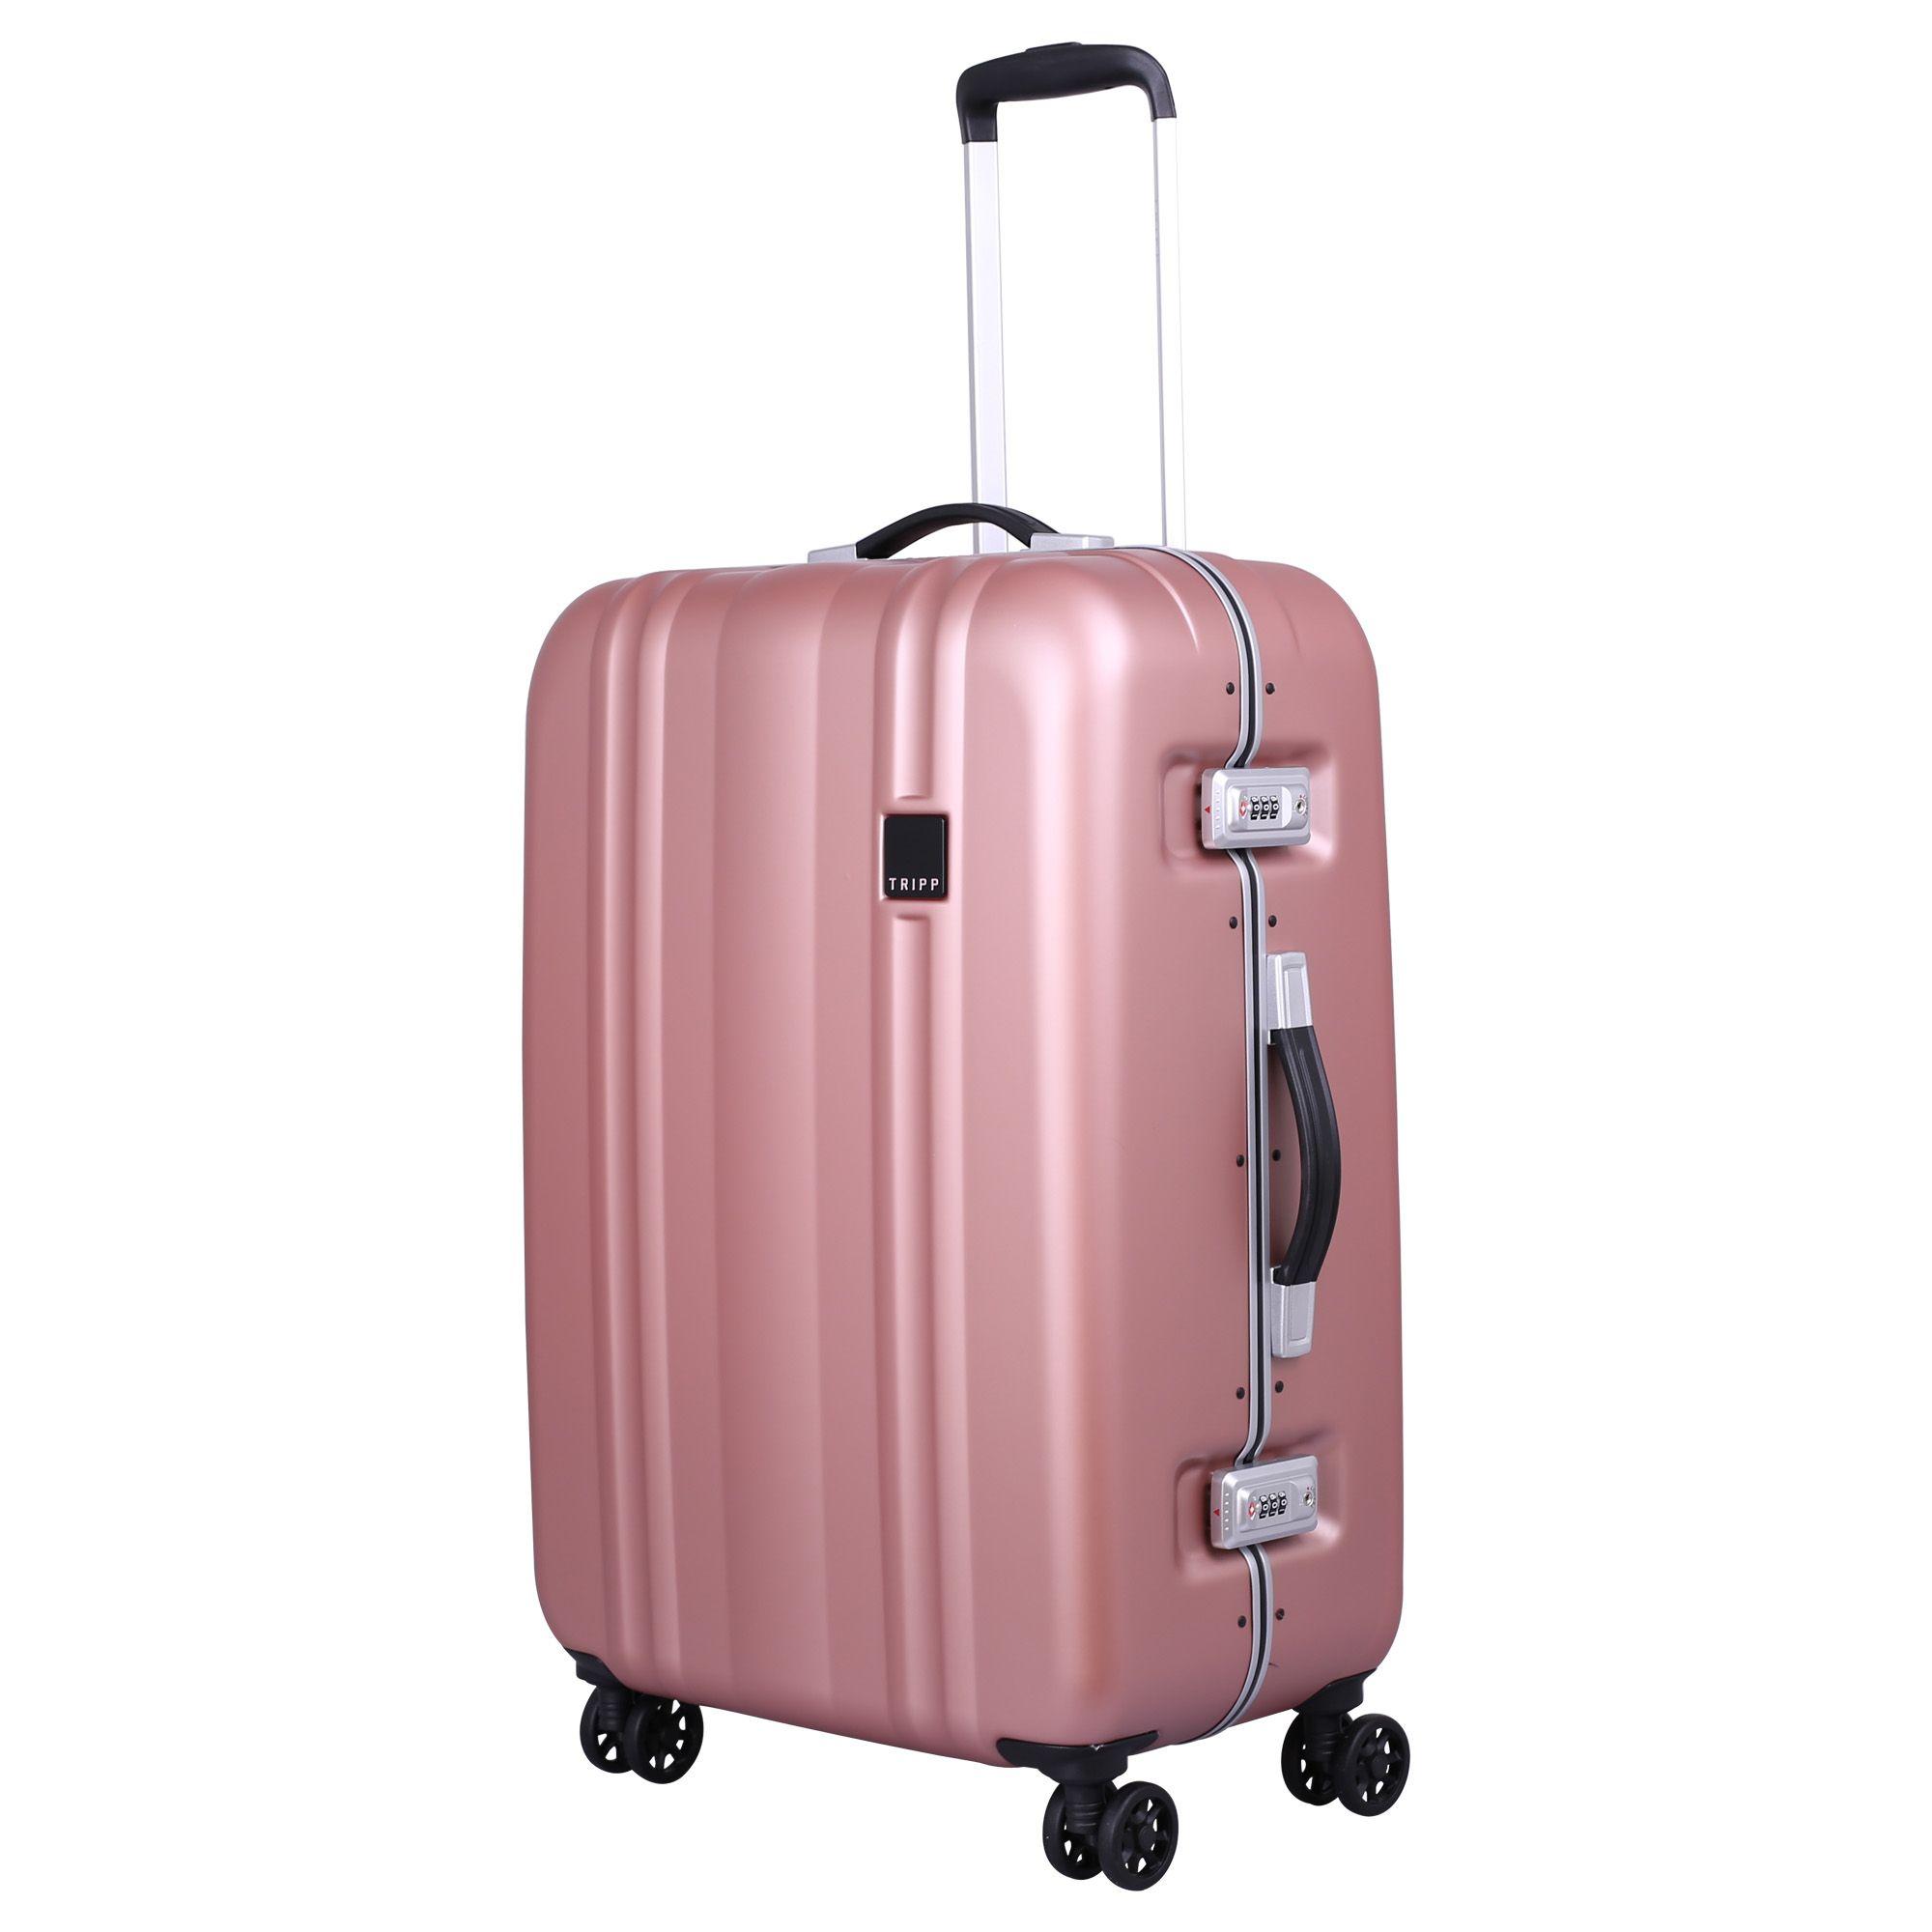 Tripp Blush  Absolute Lite II Frame  Medium 4 Wheel Case - Hard Suitcases  721b3278986f8